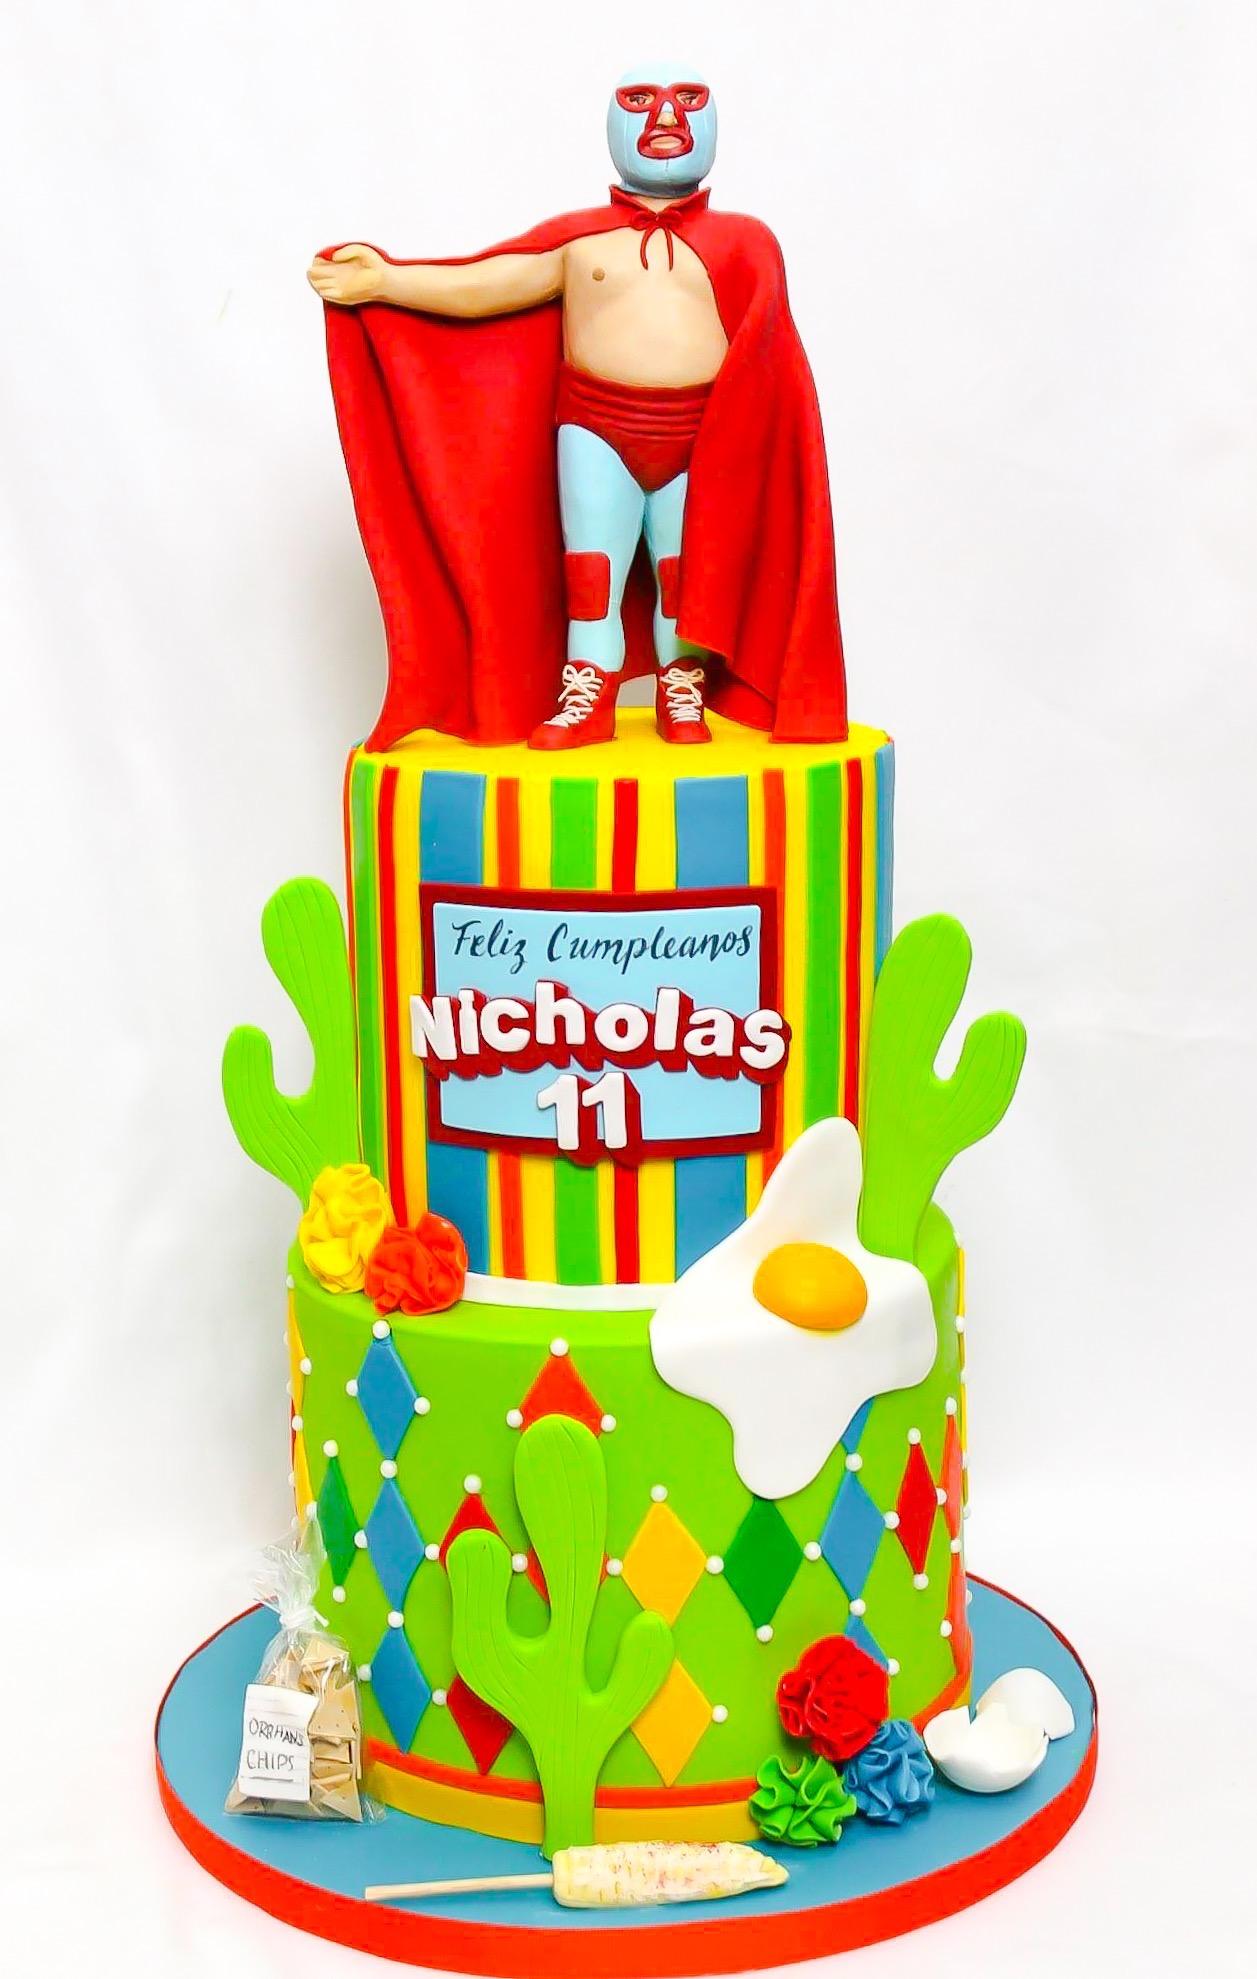 Nacho Libre themed birthday cake